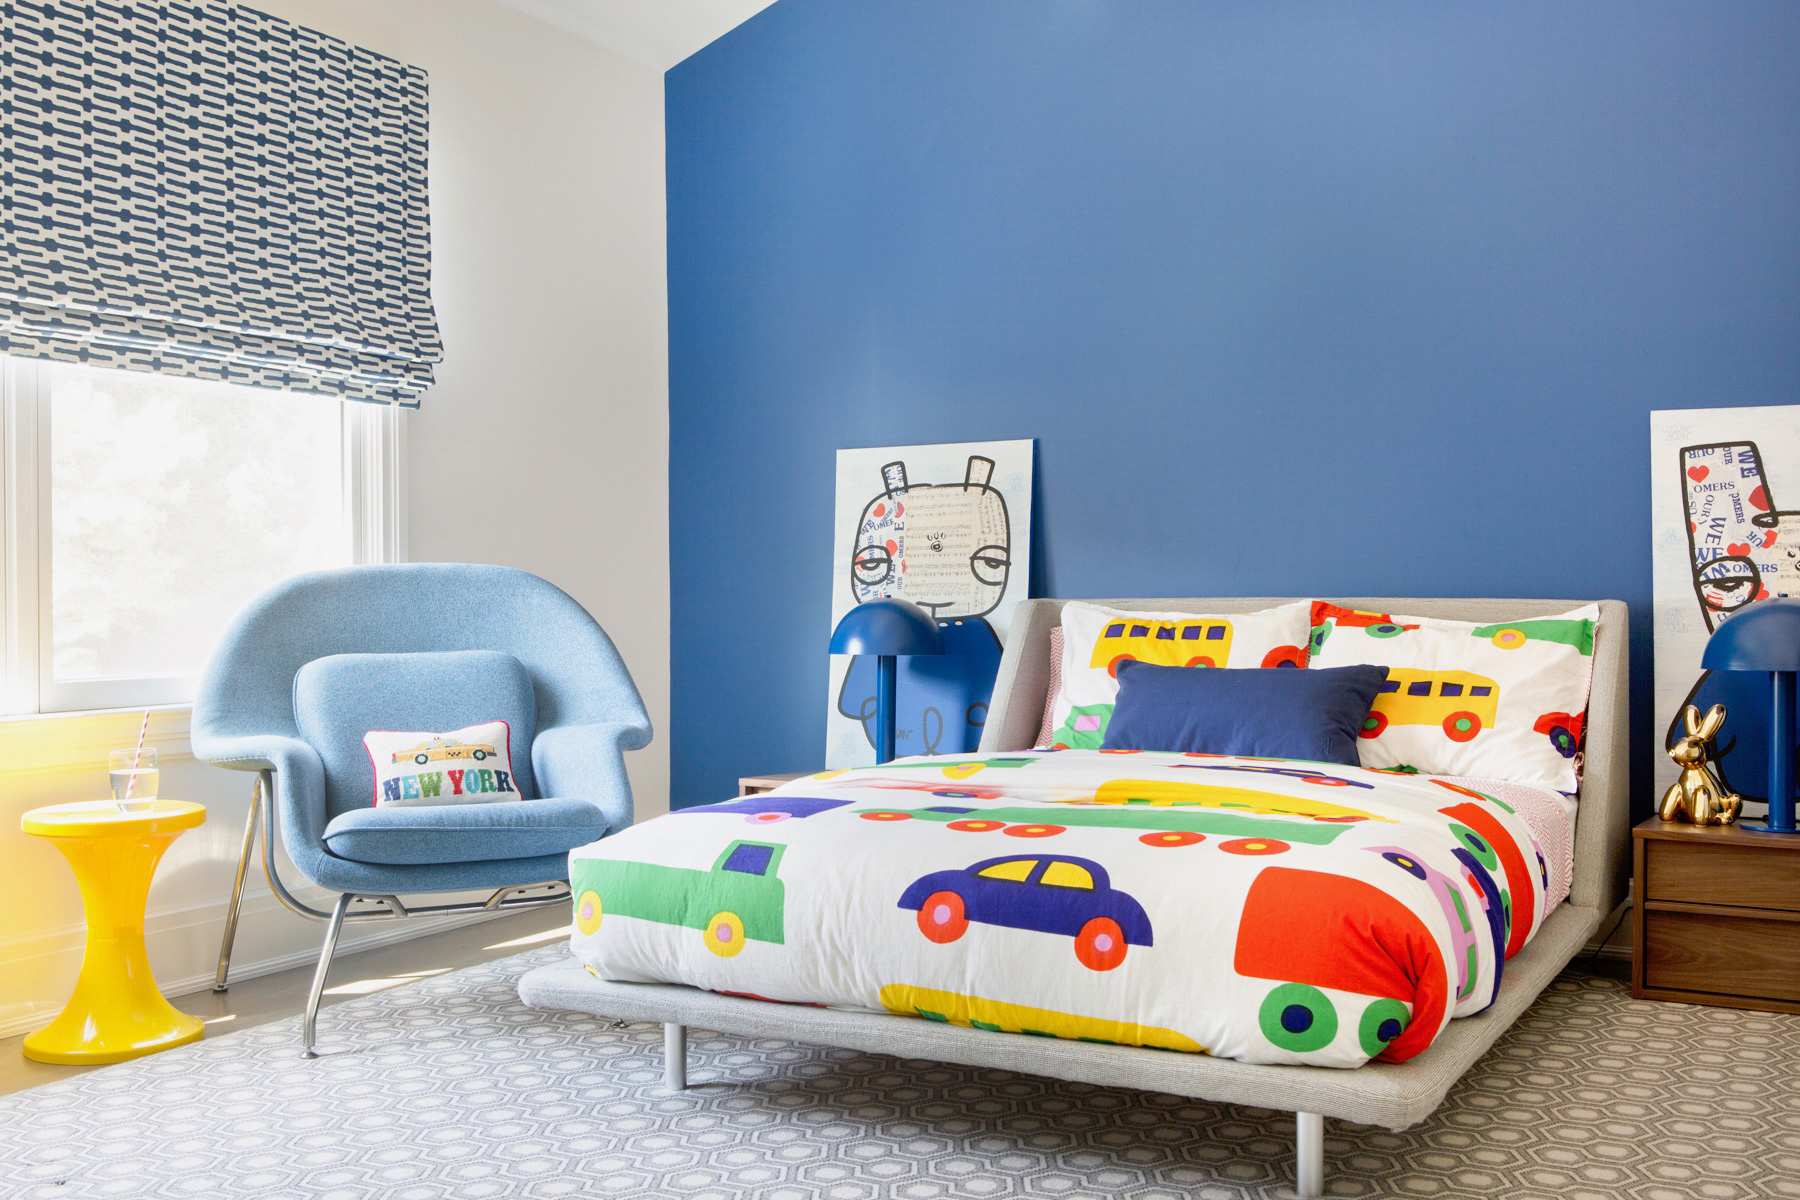 interiors-kids-are-people-new-15.jpg